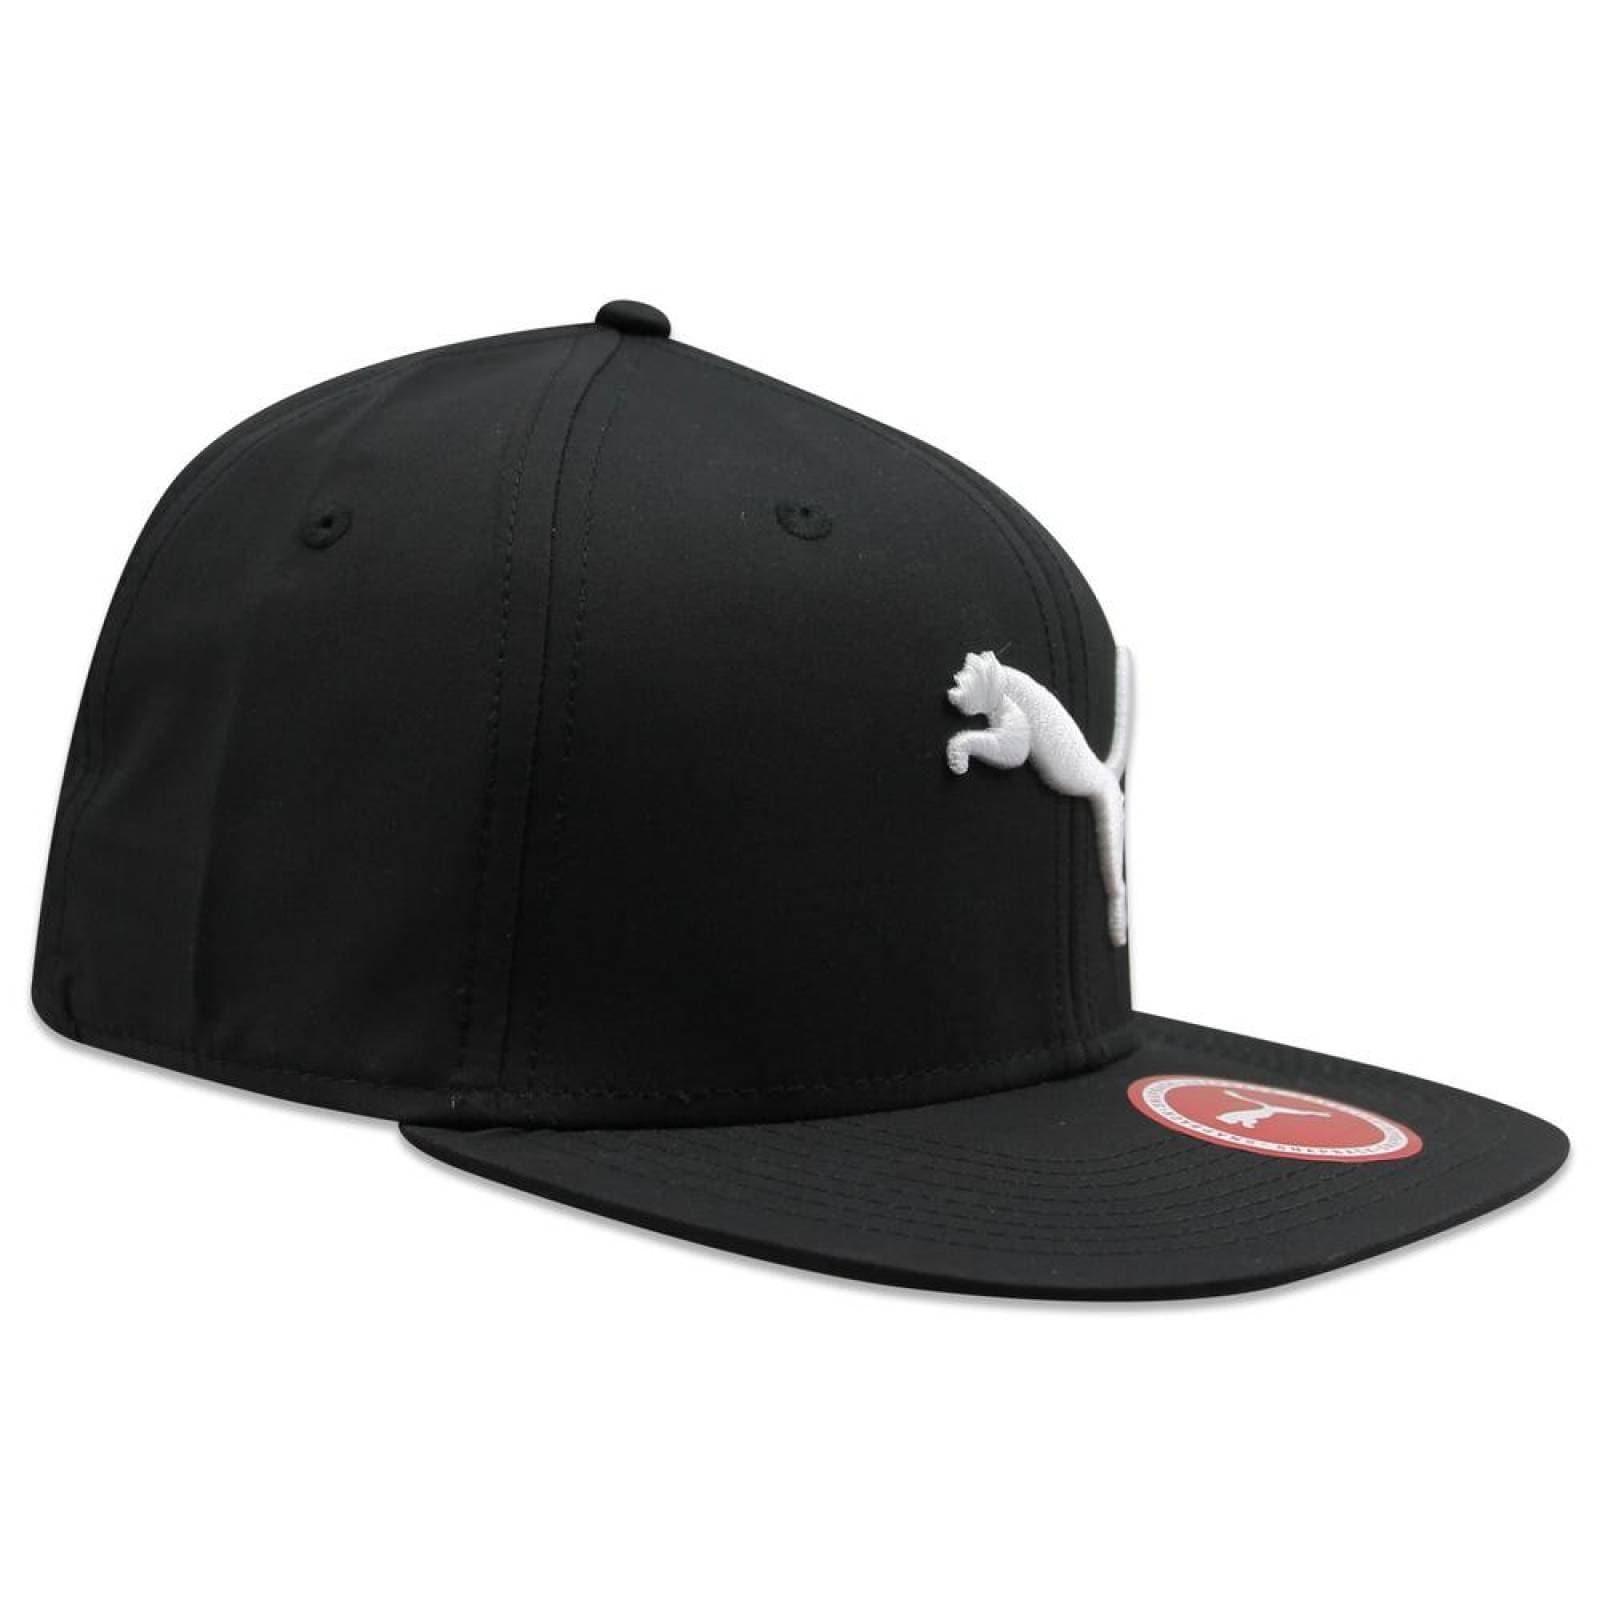 Gorra Puma Snapback Flatbrim Negro